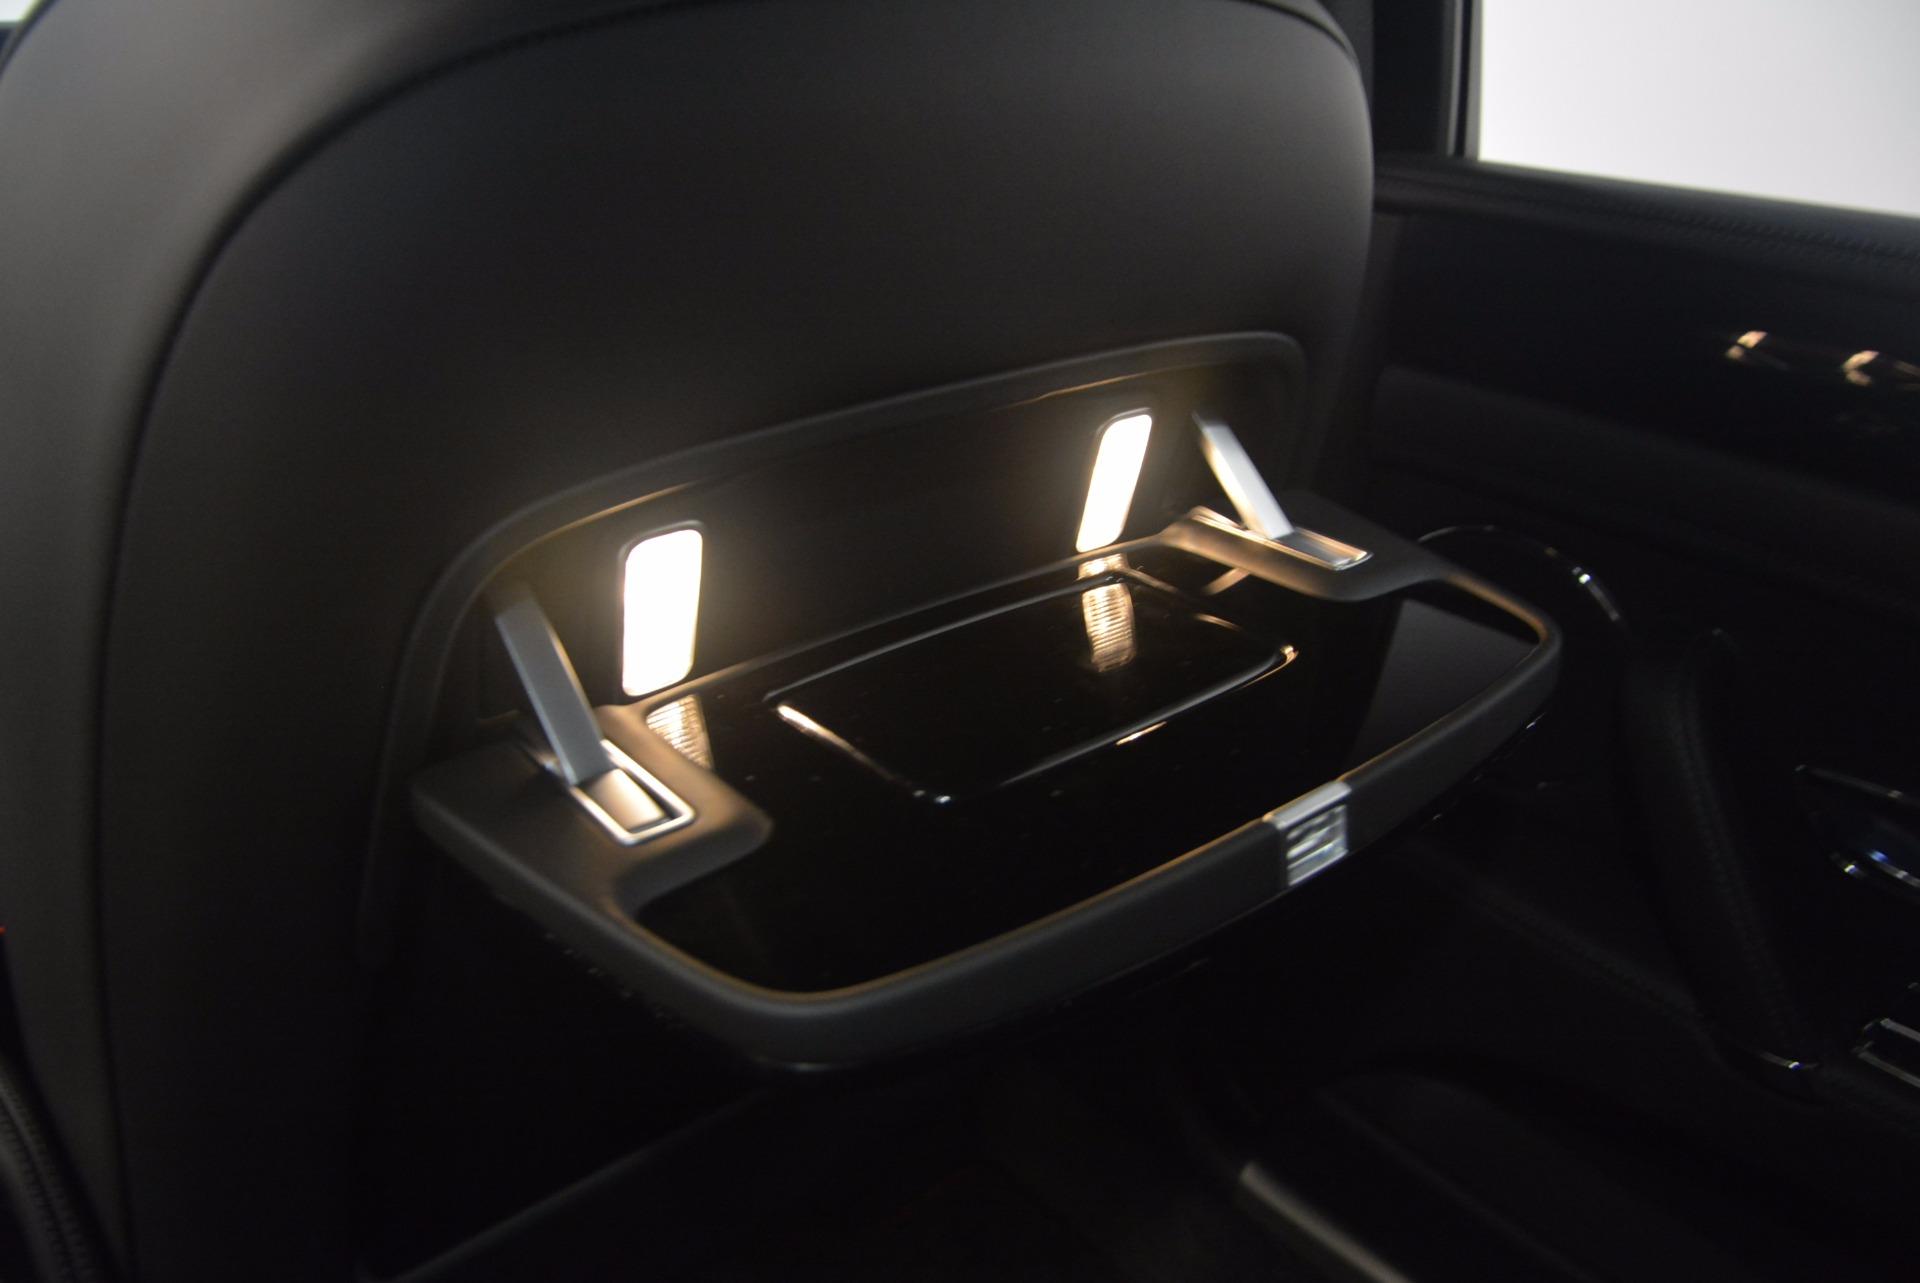 Used 2015 Bentley Flying Spur V8 For Sale In Westport, CT 1199_p36